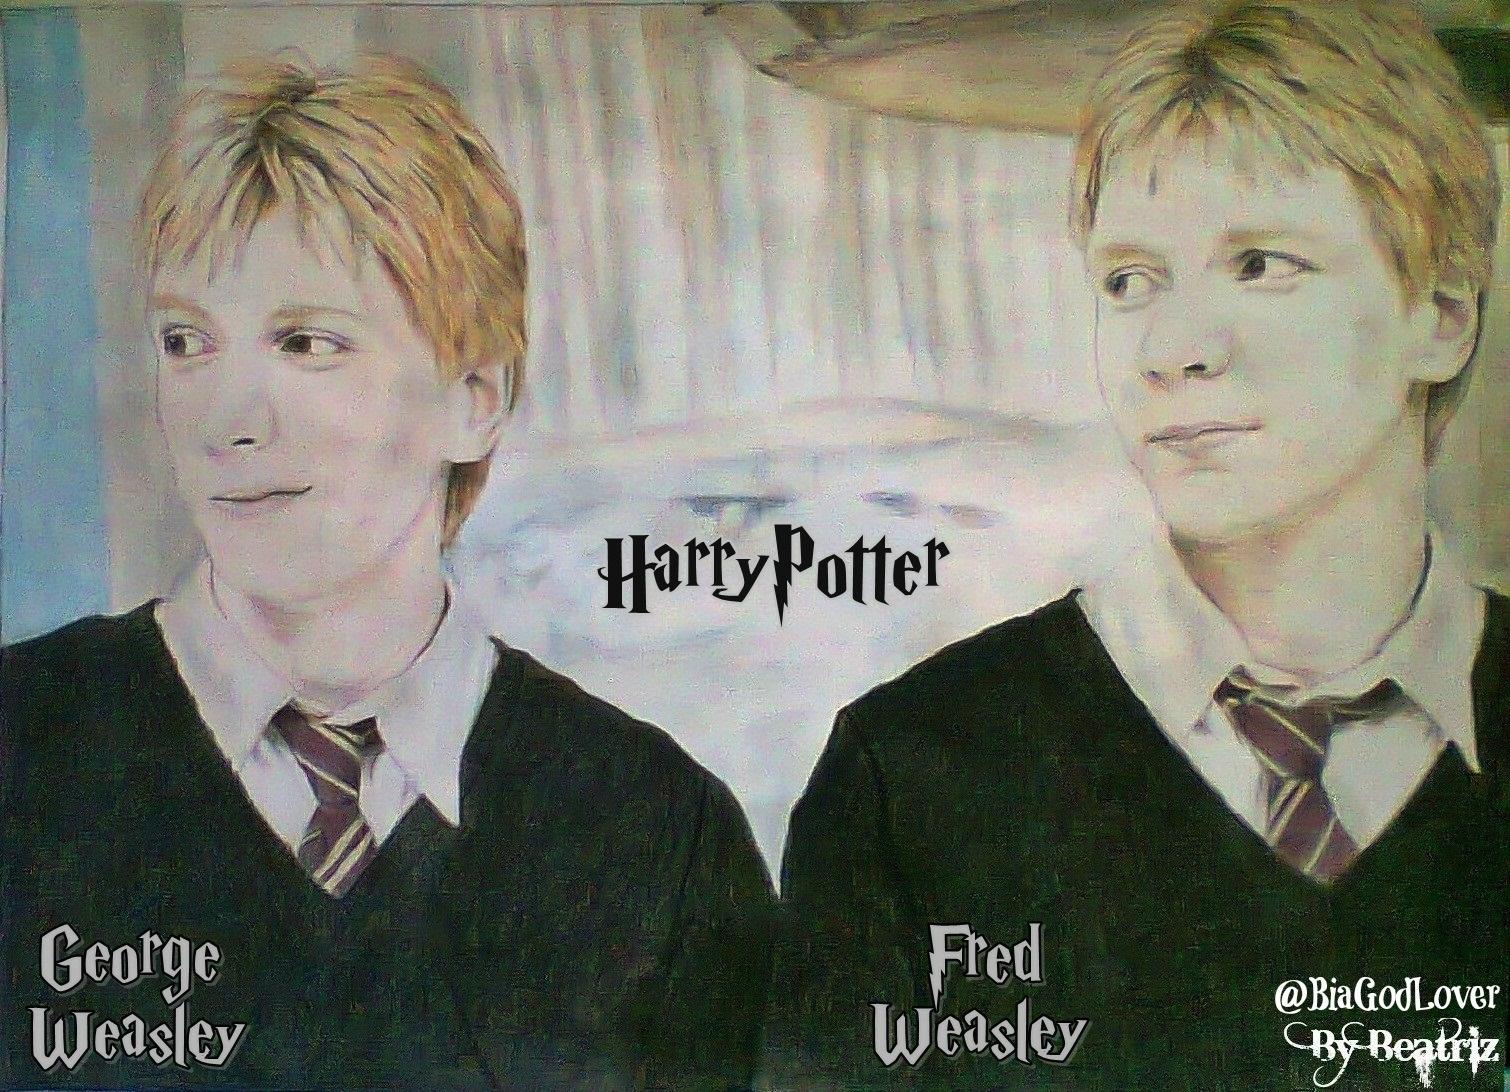 Must see Wallpaper Harry Potter Fanart - James-Oliver-Fred-George-Weasley-Harry-Potter-fanart-33255669-1510-1092  Photograph_58212.jpg